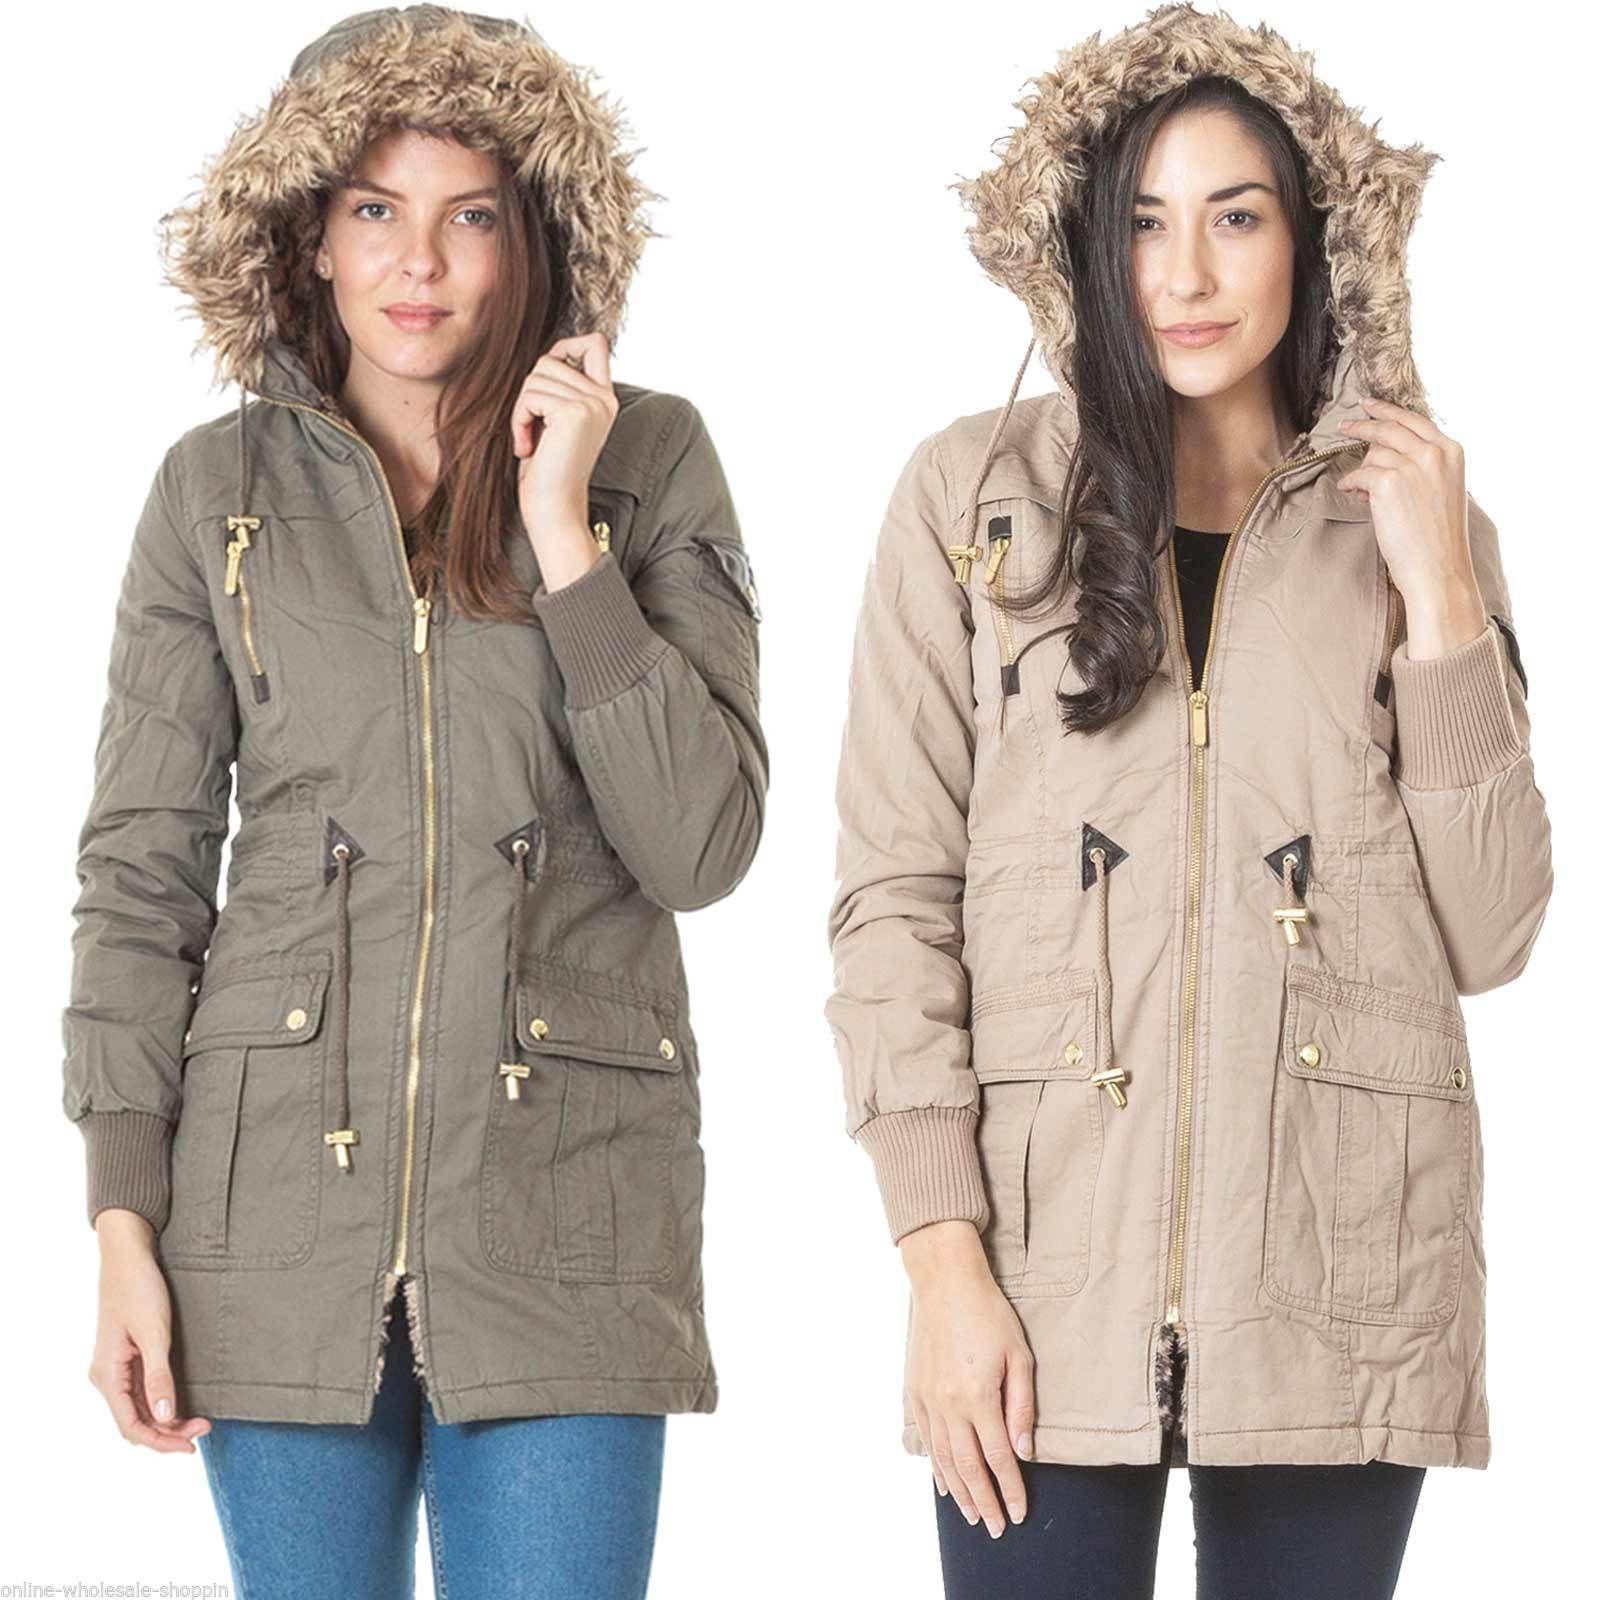 Coats Jackets And Vests 175783 New Womens Brave Soul Parka Fur